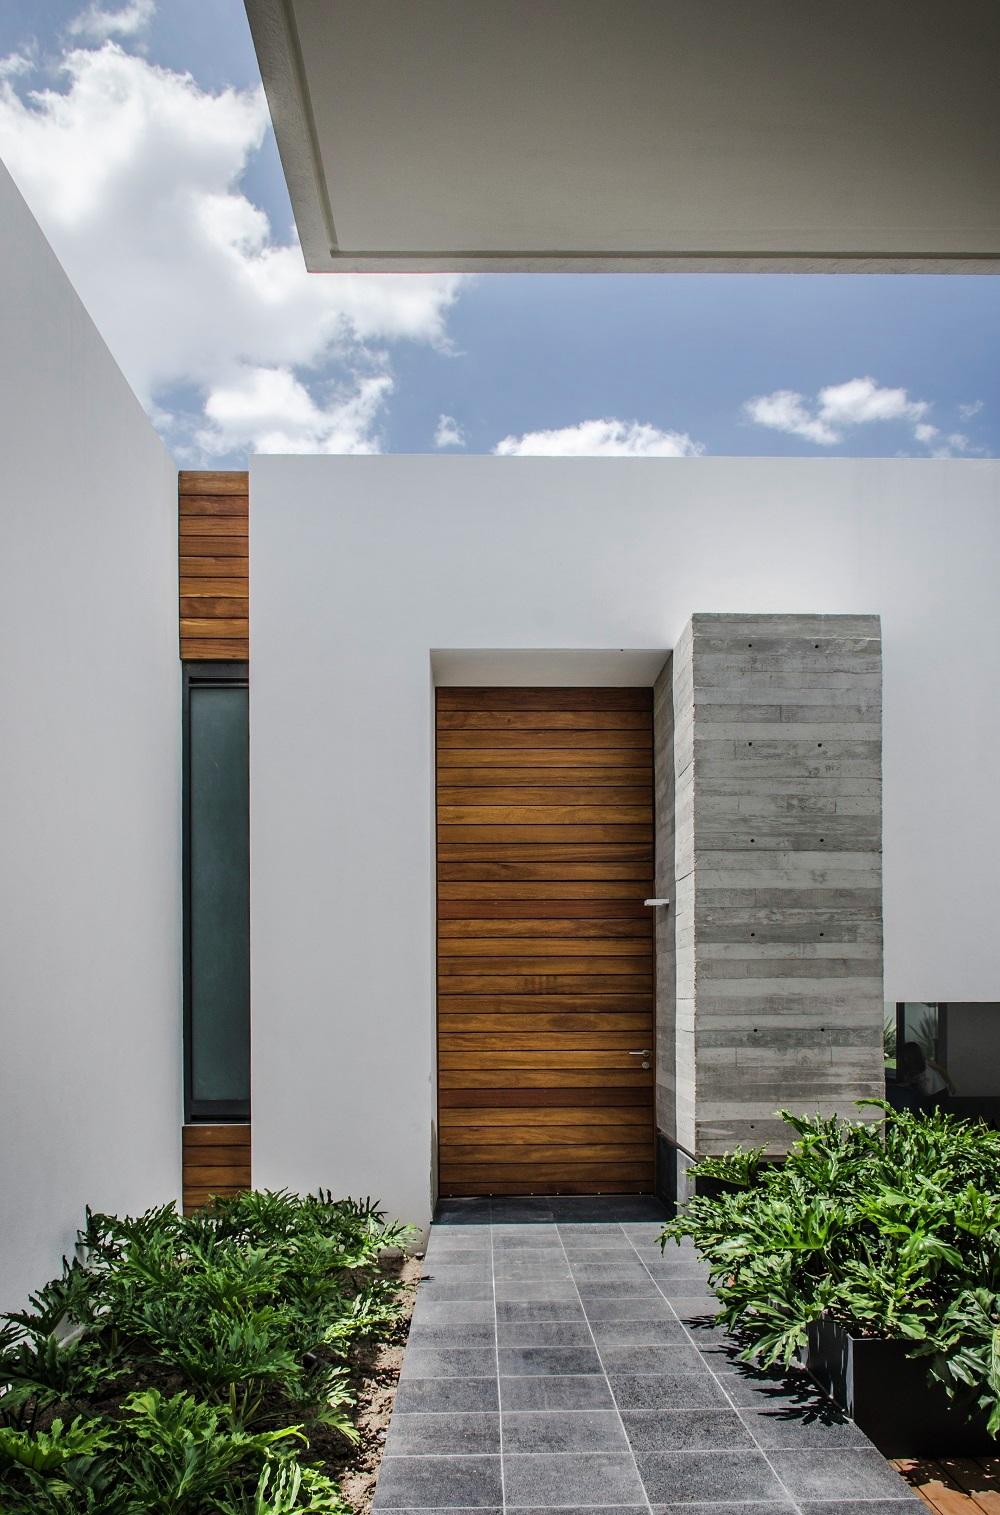 galeria de casa b g adi arquitectura y dise o interior 24 On g p arquitectura y diseno